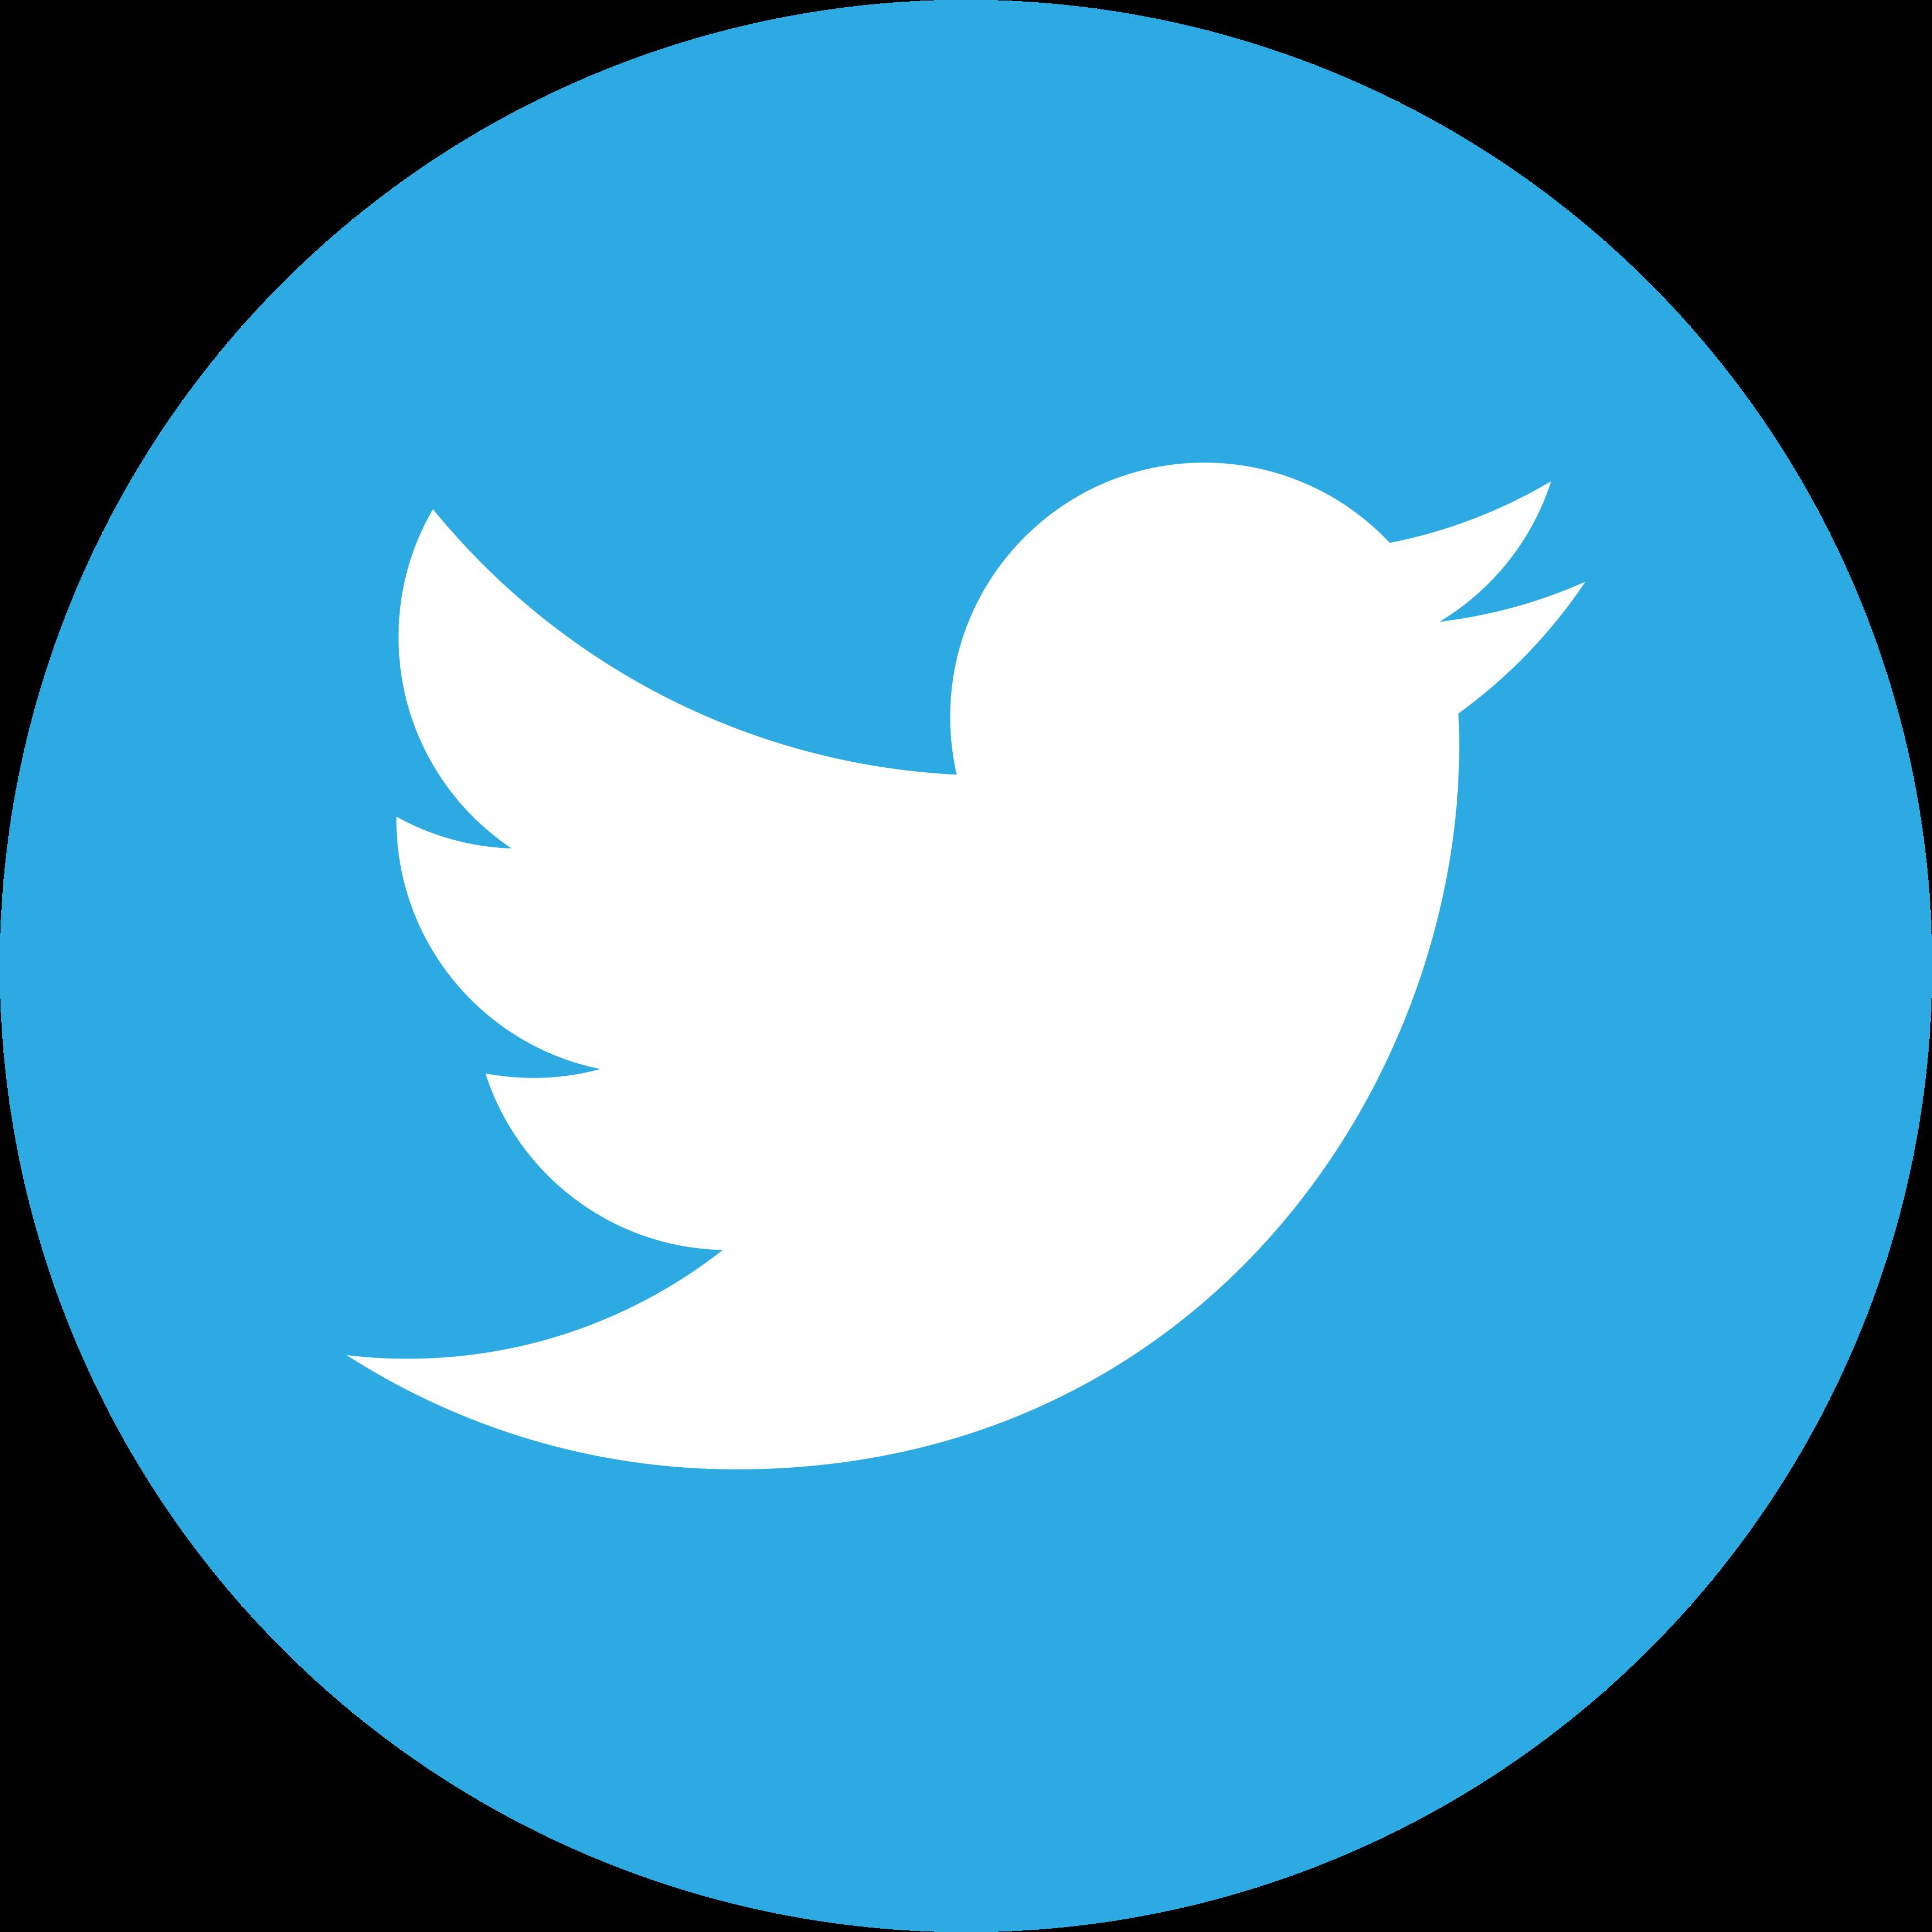 TwitterLB